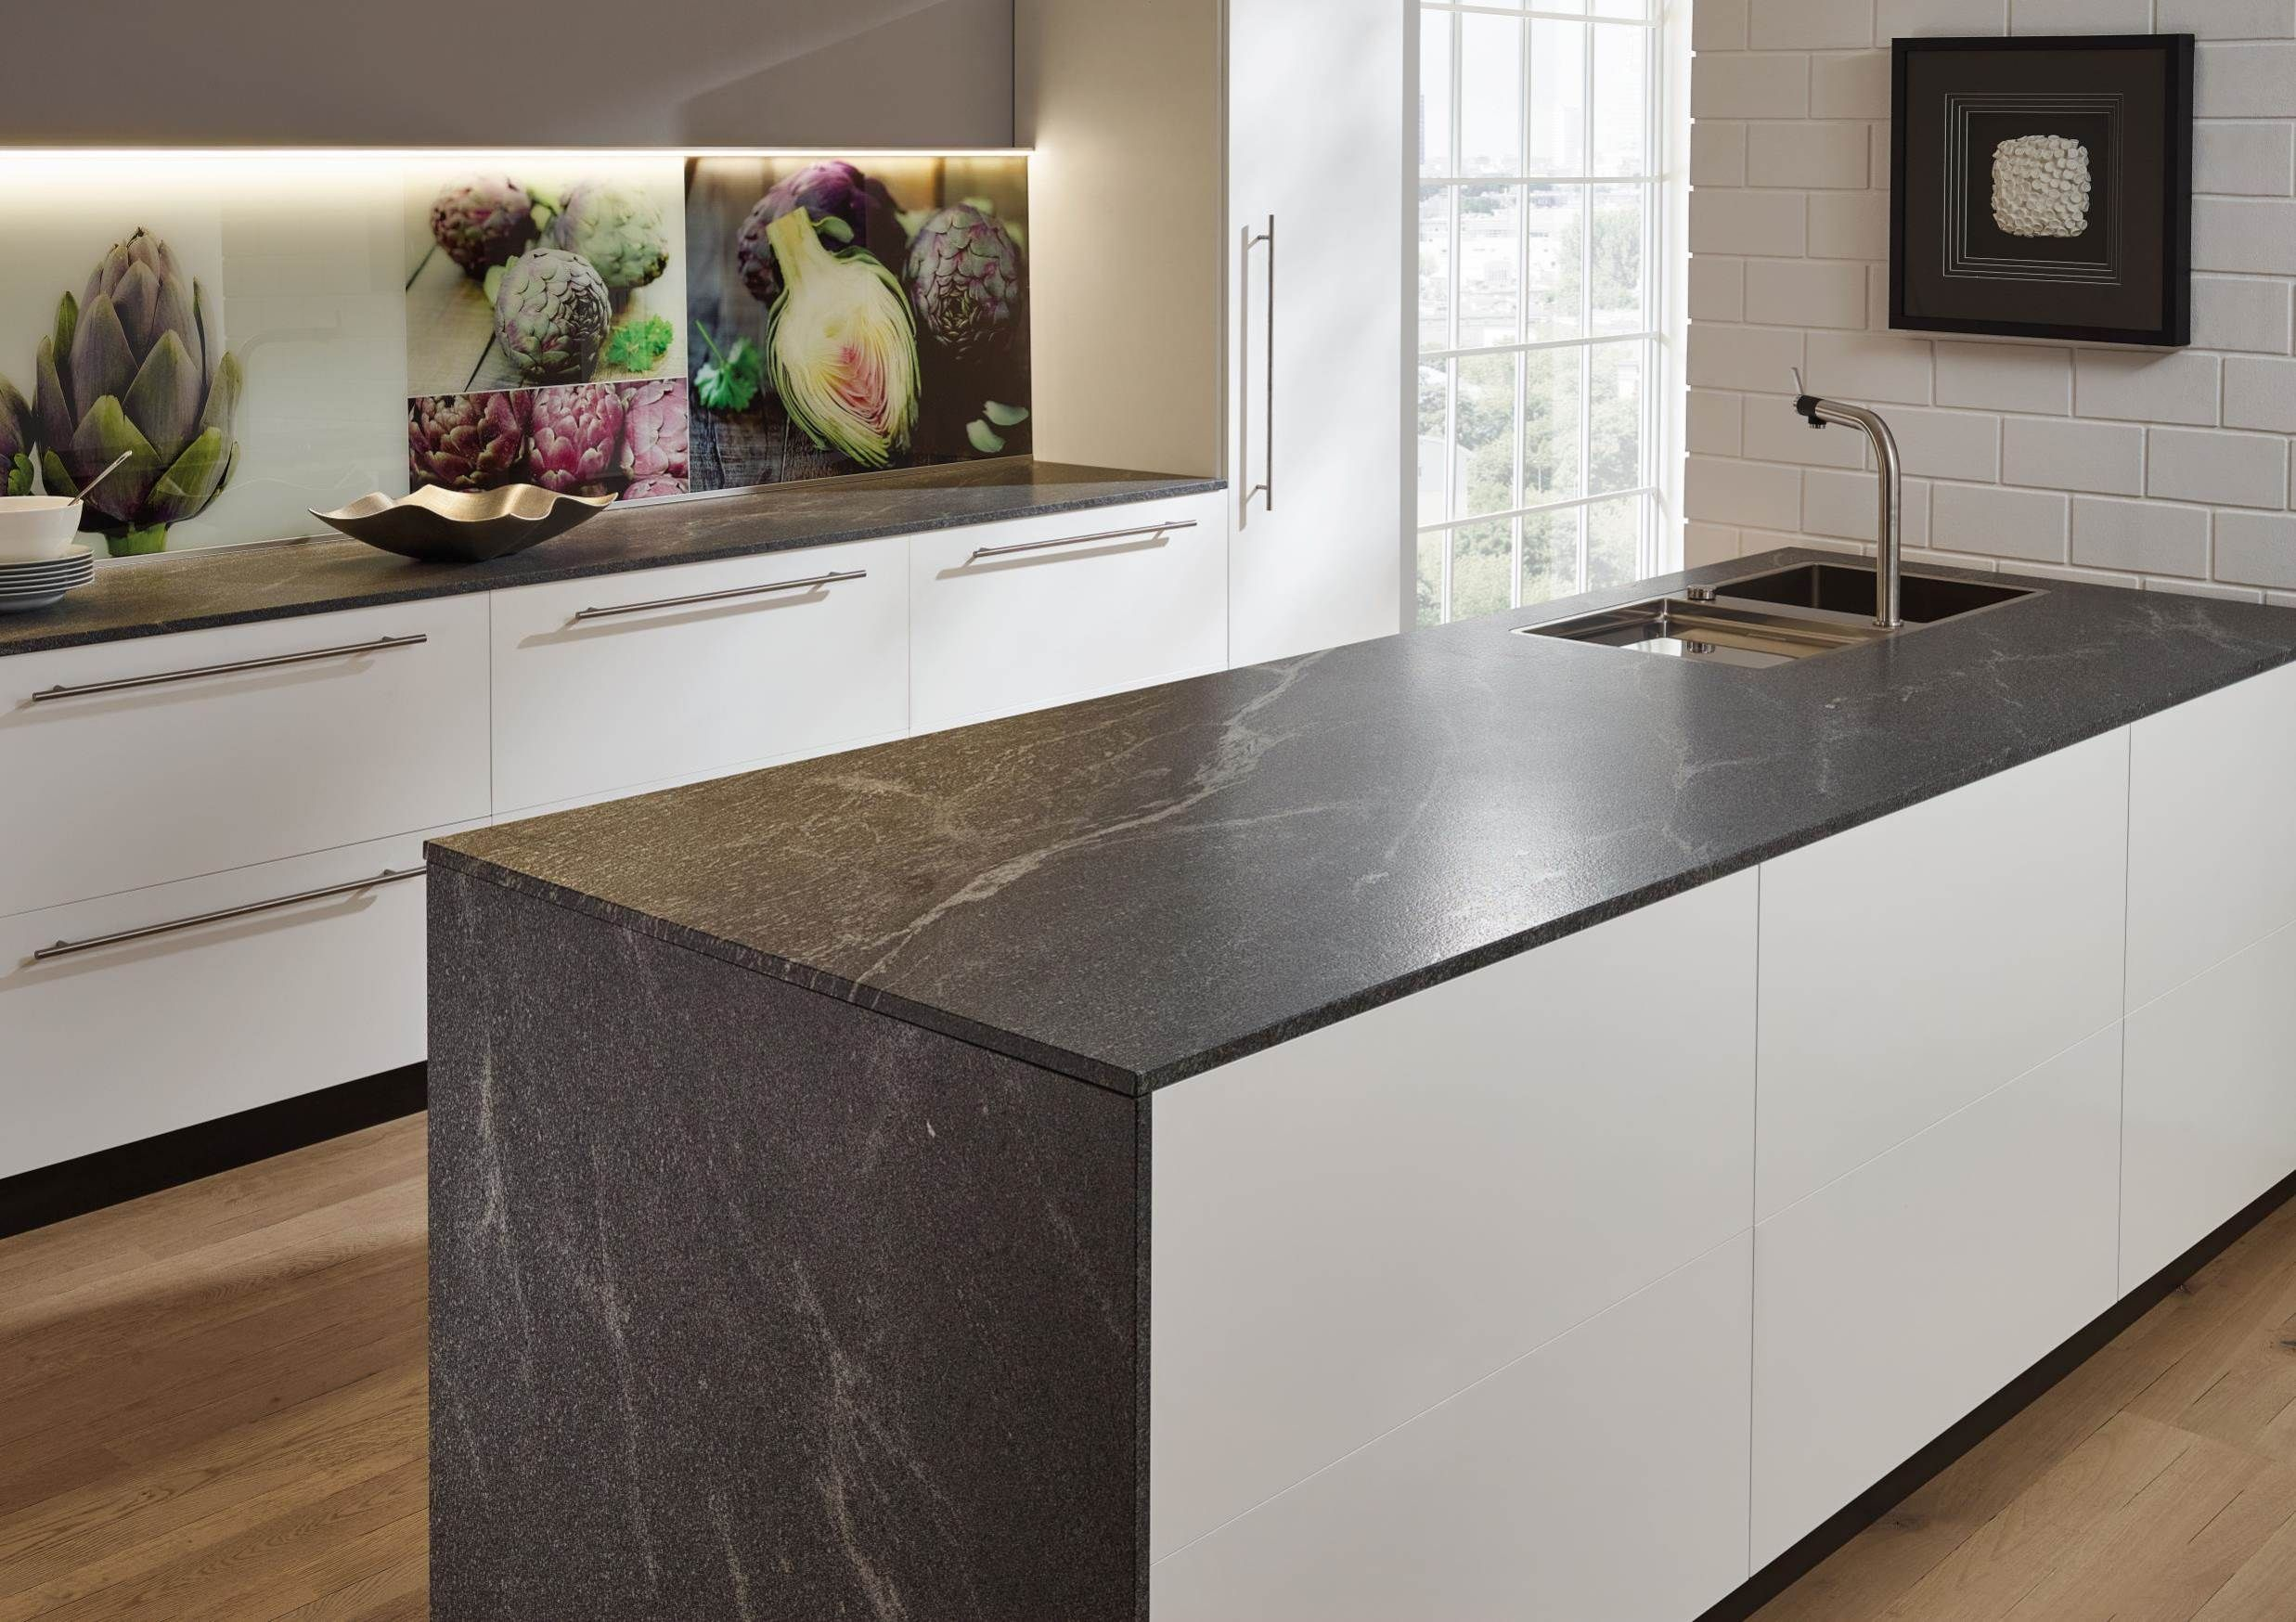 Lechner Kuchenarbeitsplatten Design Elegant Grey Umbau Kleiner Kuche Arbeitsplatte Kuche Kuche